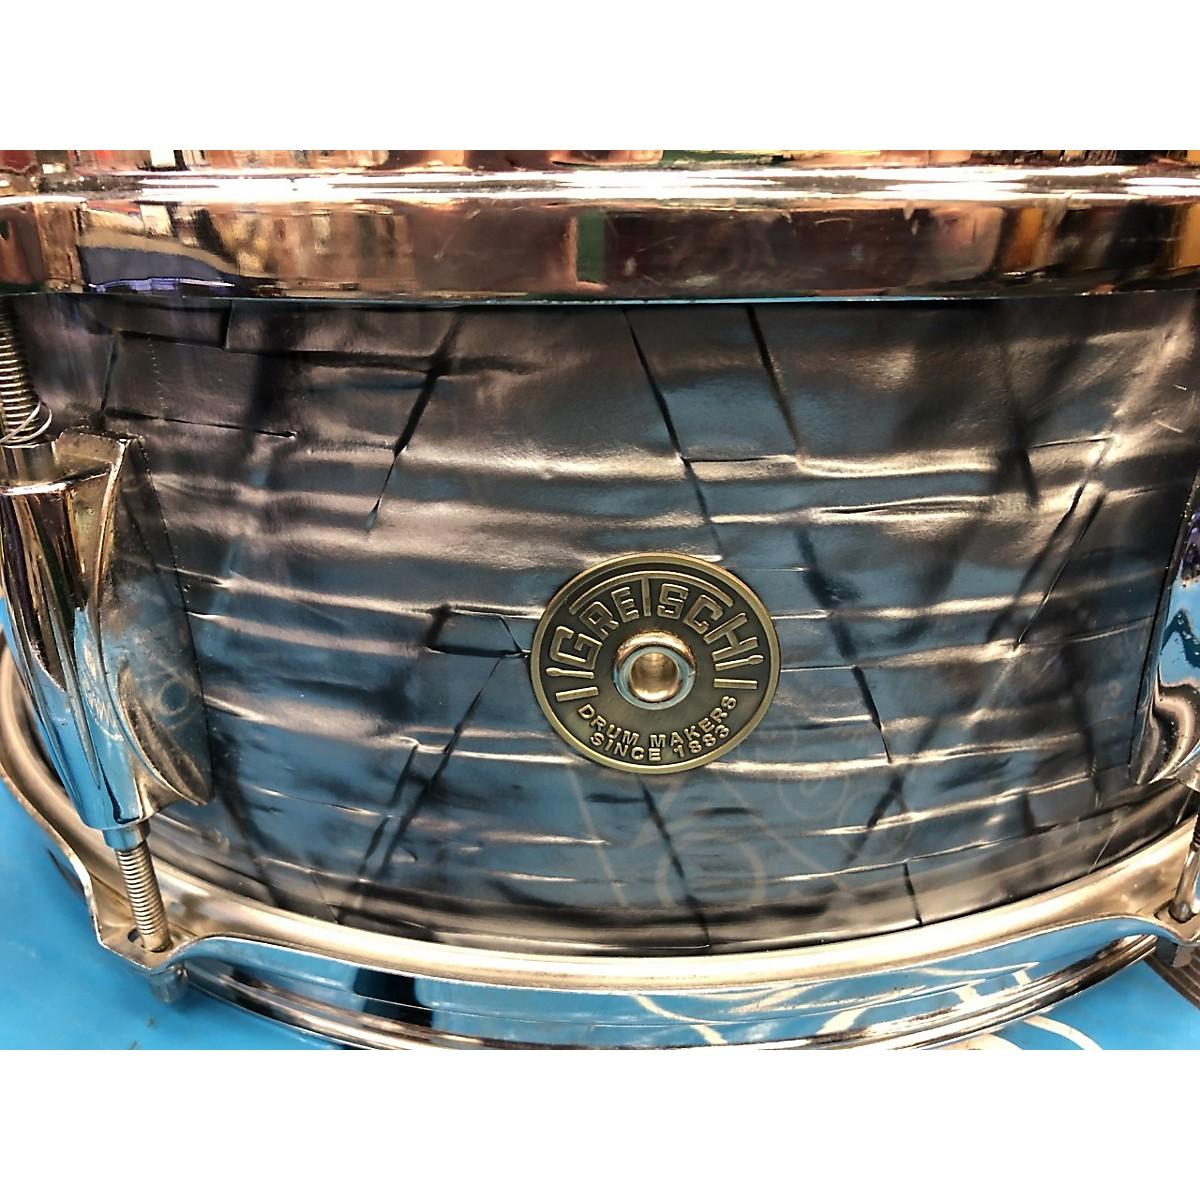 Gretsch Drums 1960s 14X6 Concert Snare Drum